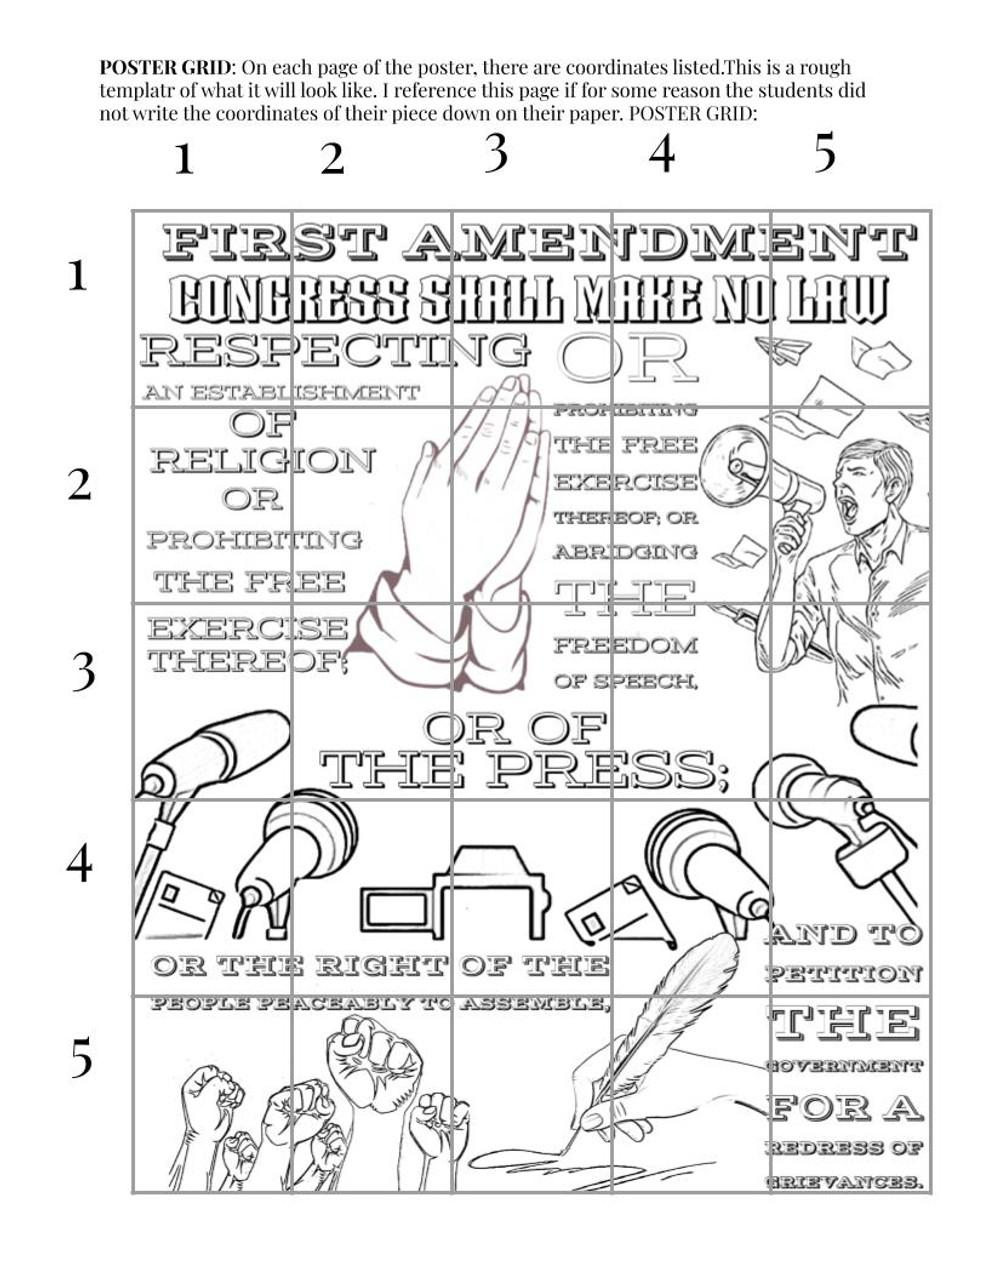 First Amendment Collaborative Poster